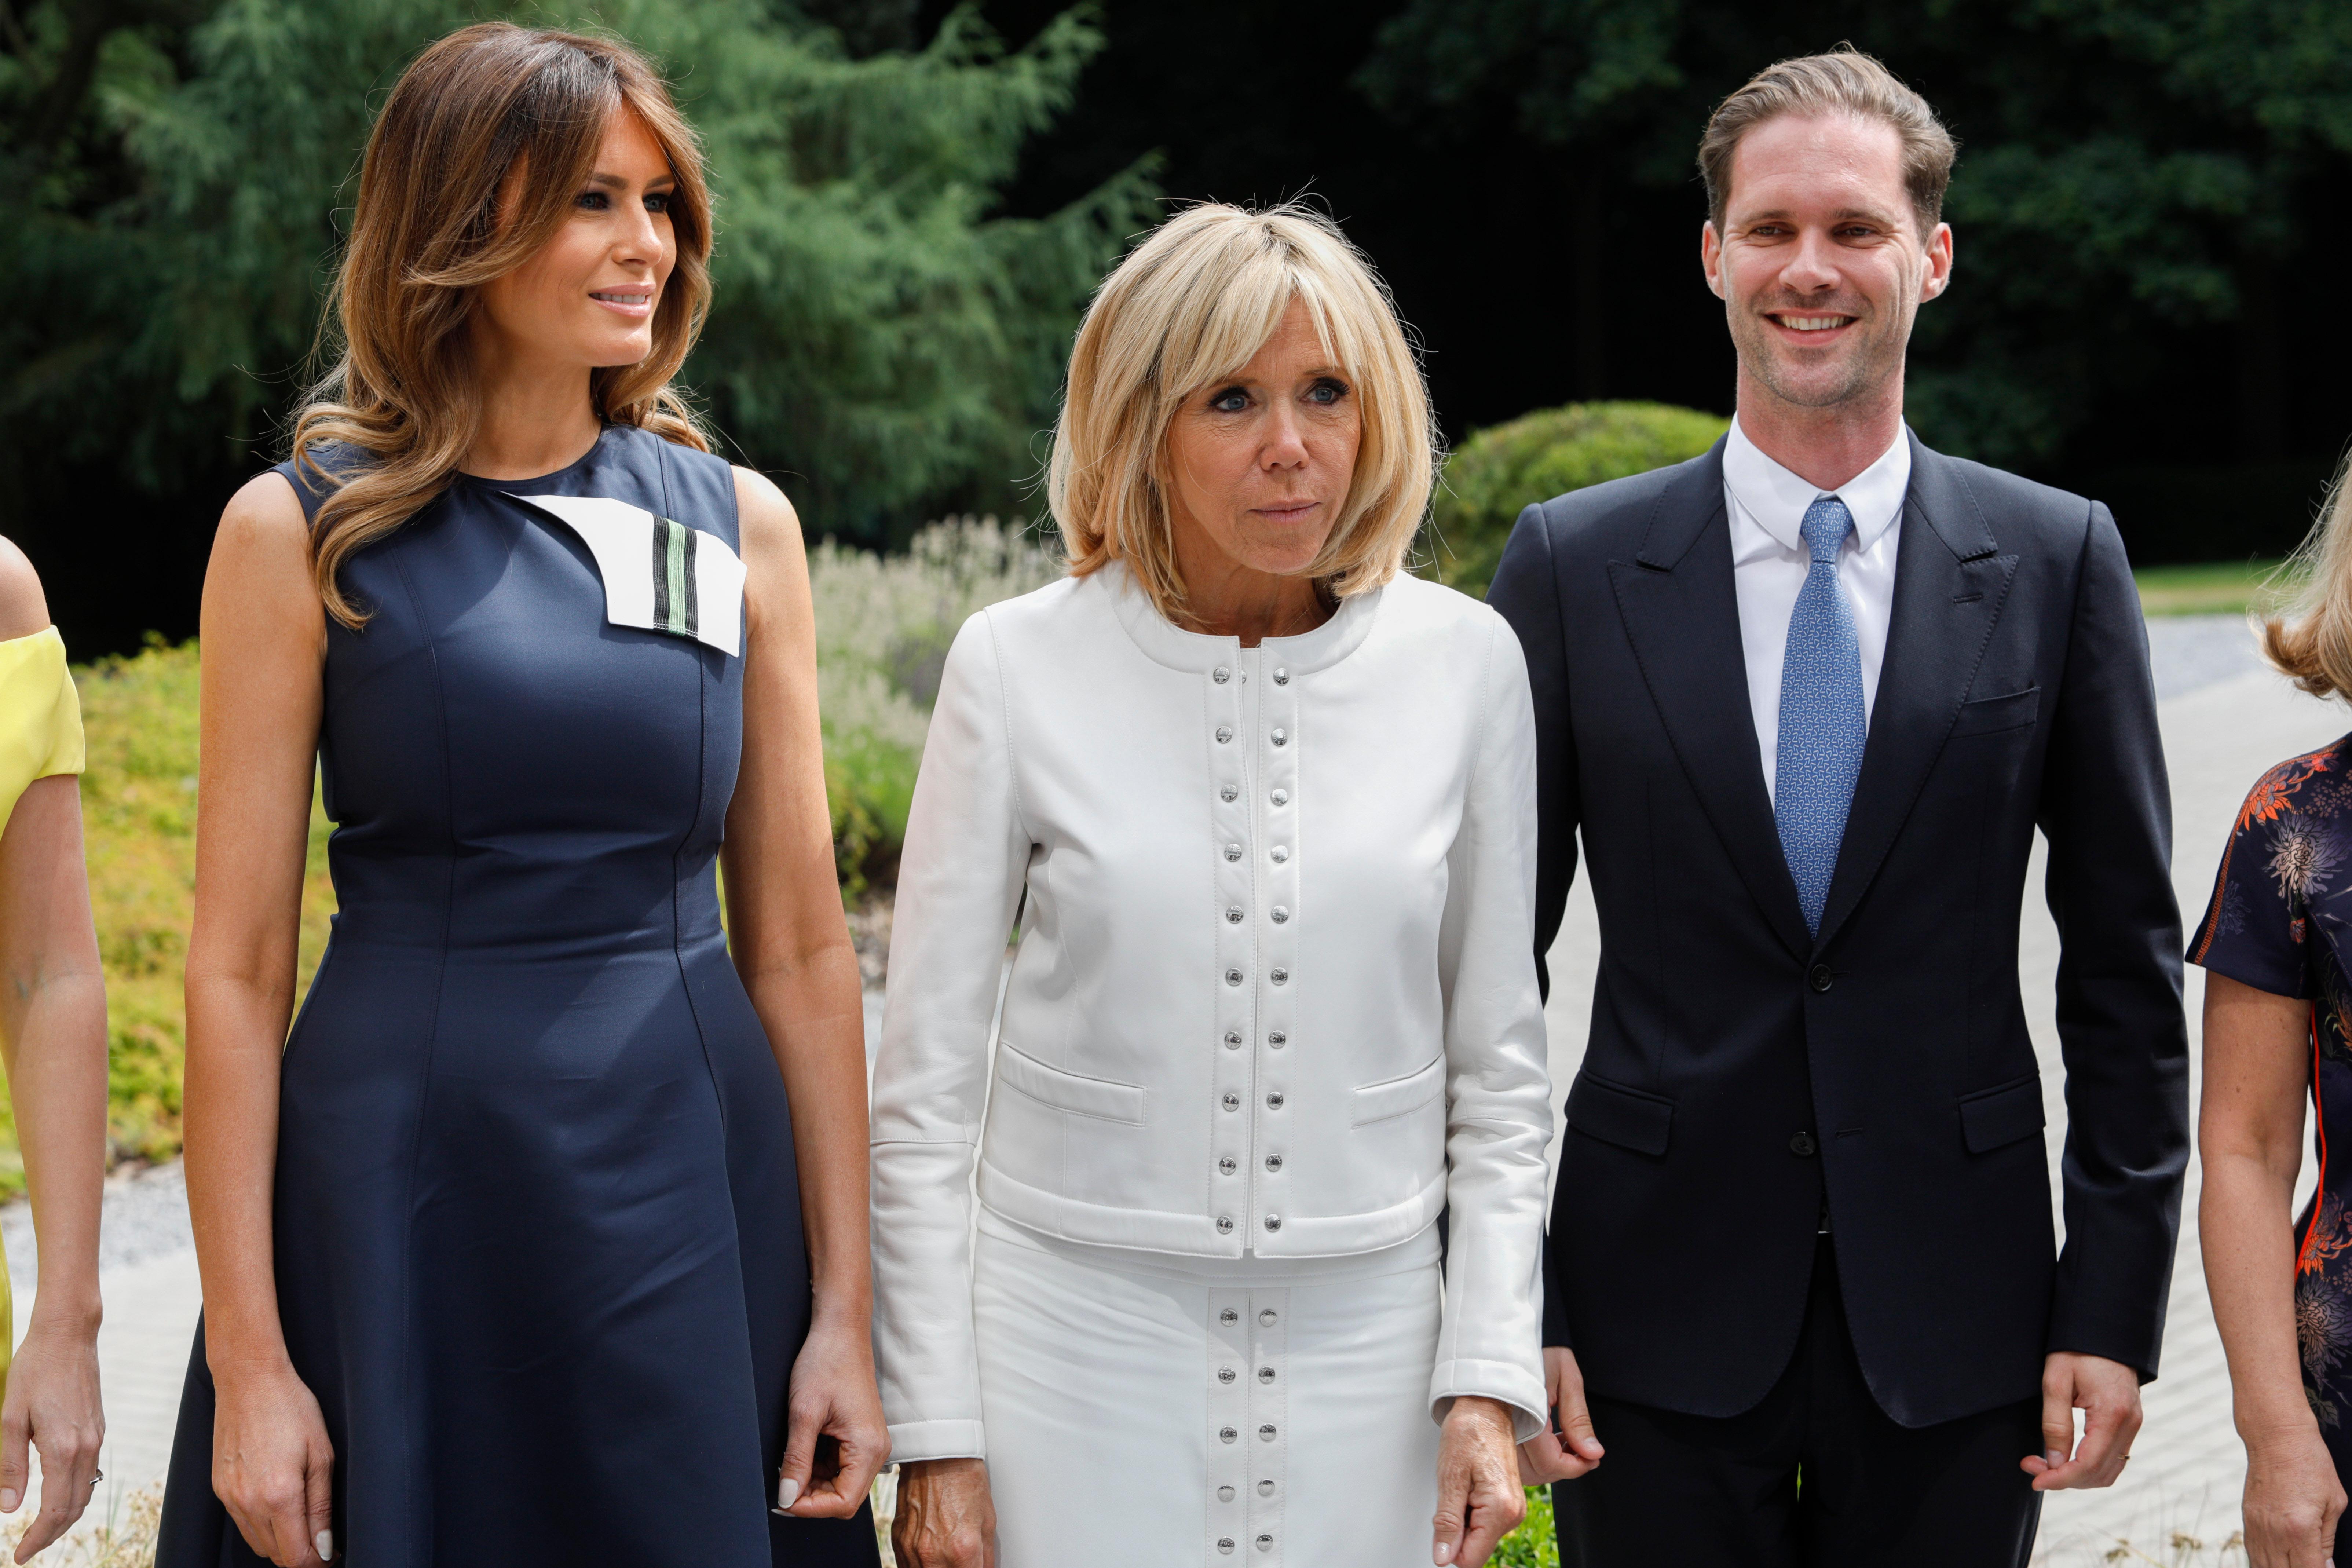 Melania Trump, Brigitte Trogneux, Gauthier Destenay visit the Queen Elisabeth Music Chapel in WaterlooNATO Summit, Brussels, Belgium - 11 Jul 2018